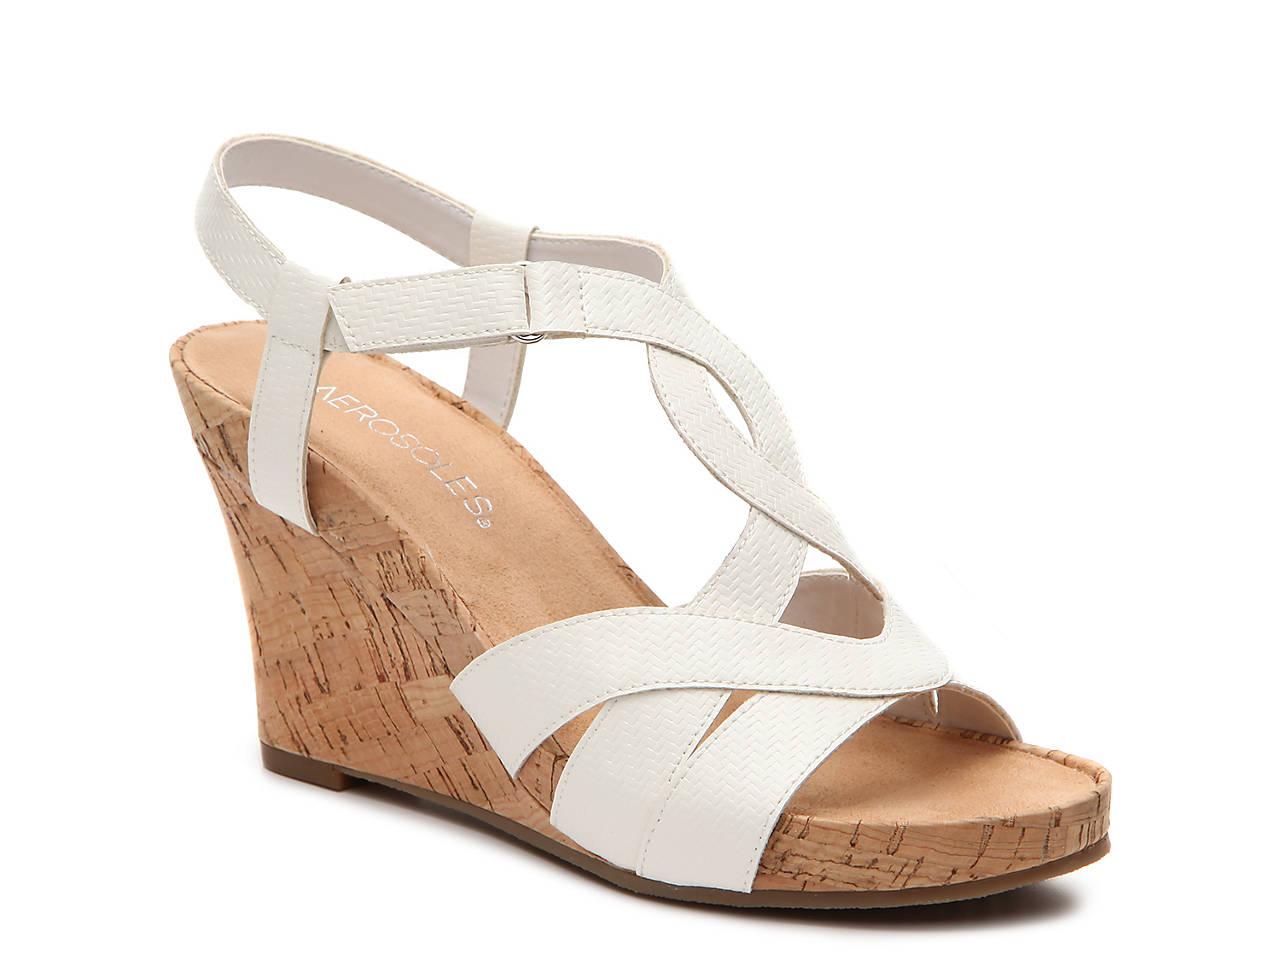 Wonderplush Wedge Sandal